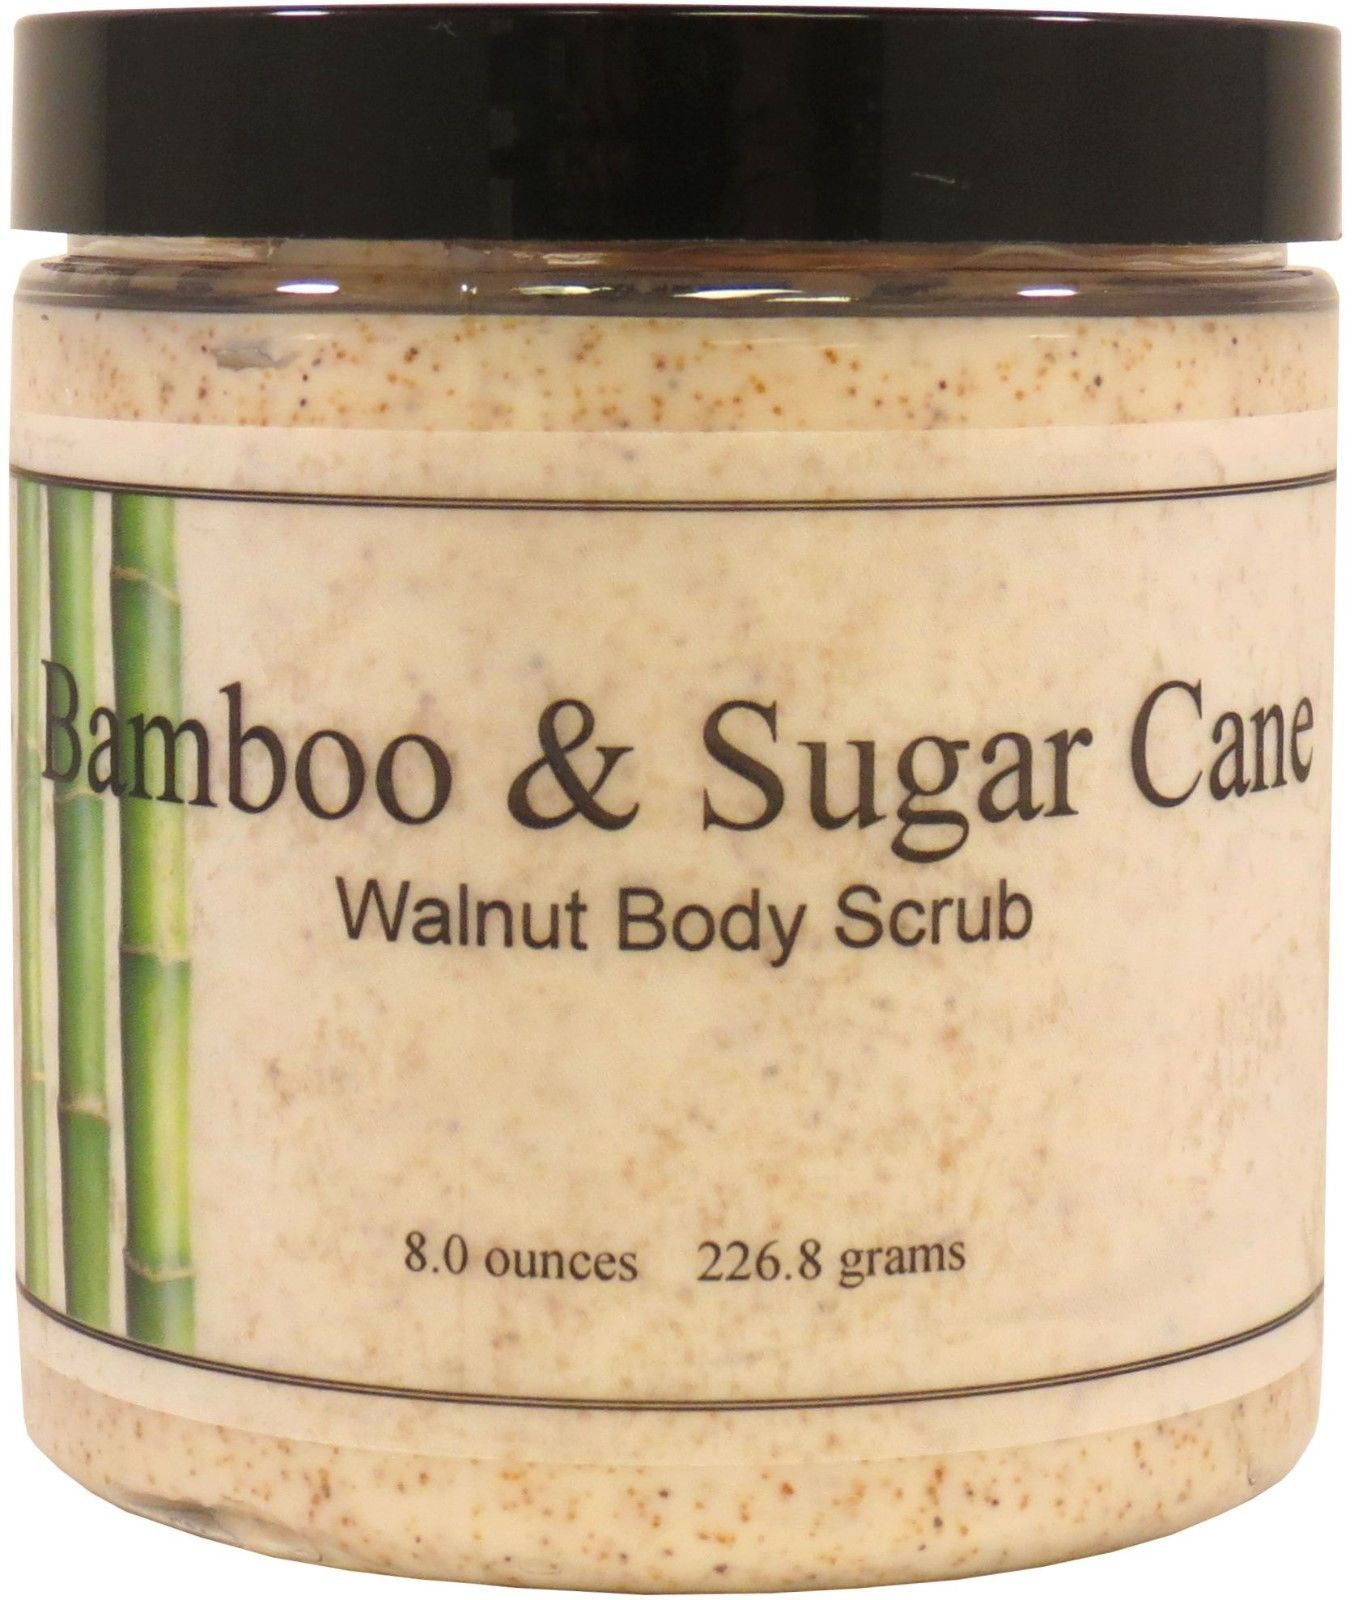 Bamboo and Sugar Cane Walnut Body Scrub